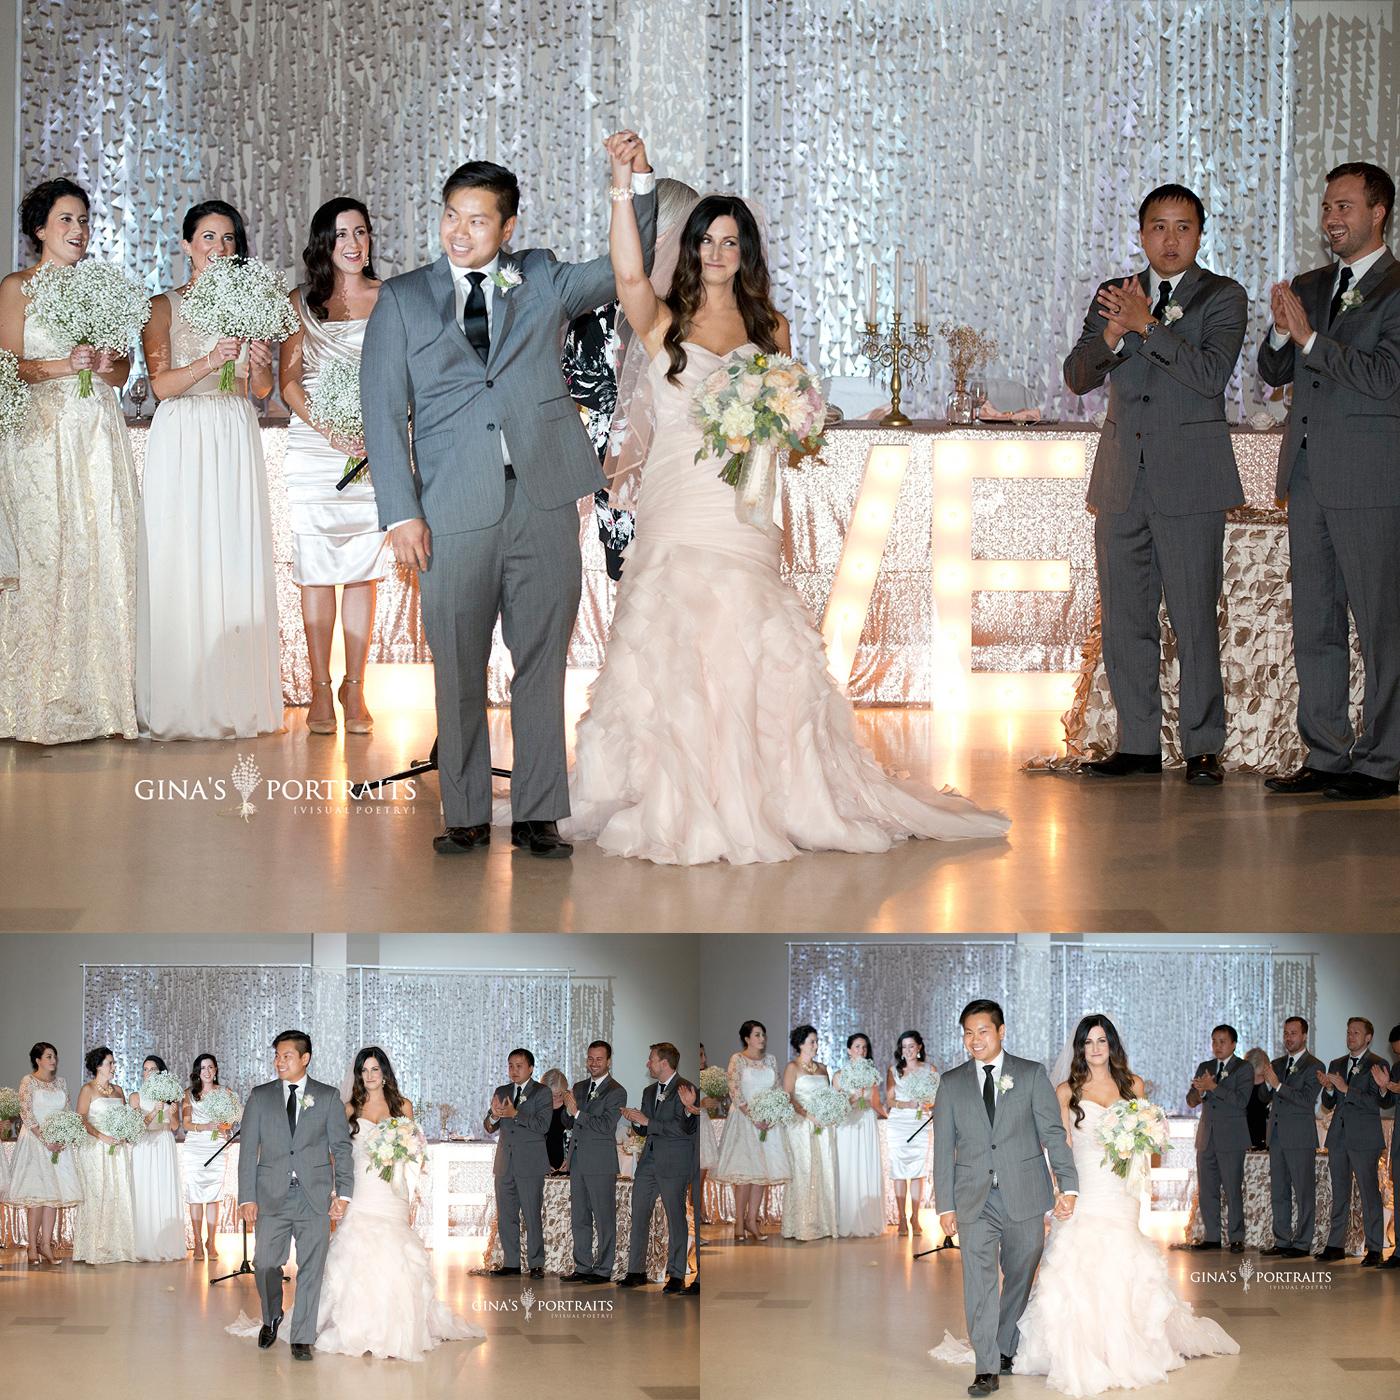 Saskatoon_Wedding_Photographer_comp064